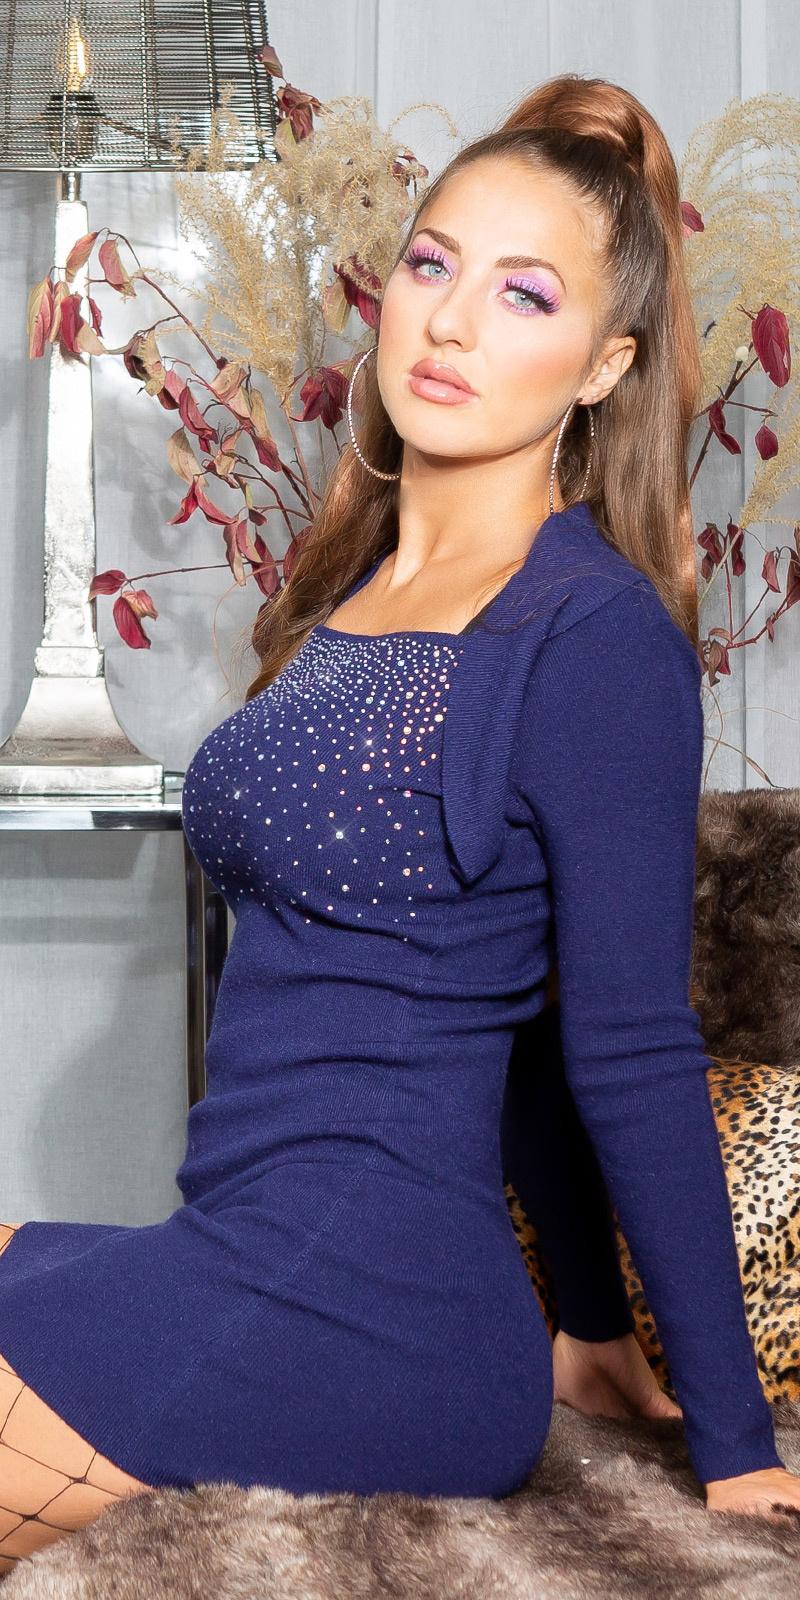 Sexy gebreide jurk met glinsterende steentjes marineblauw